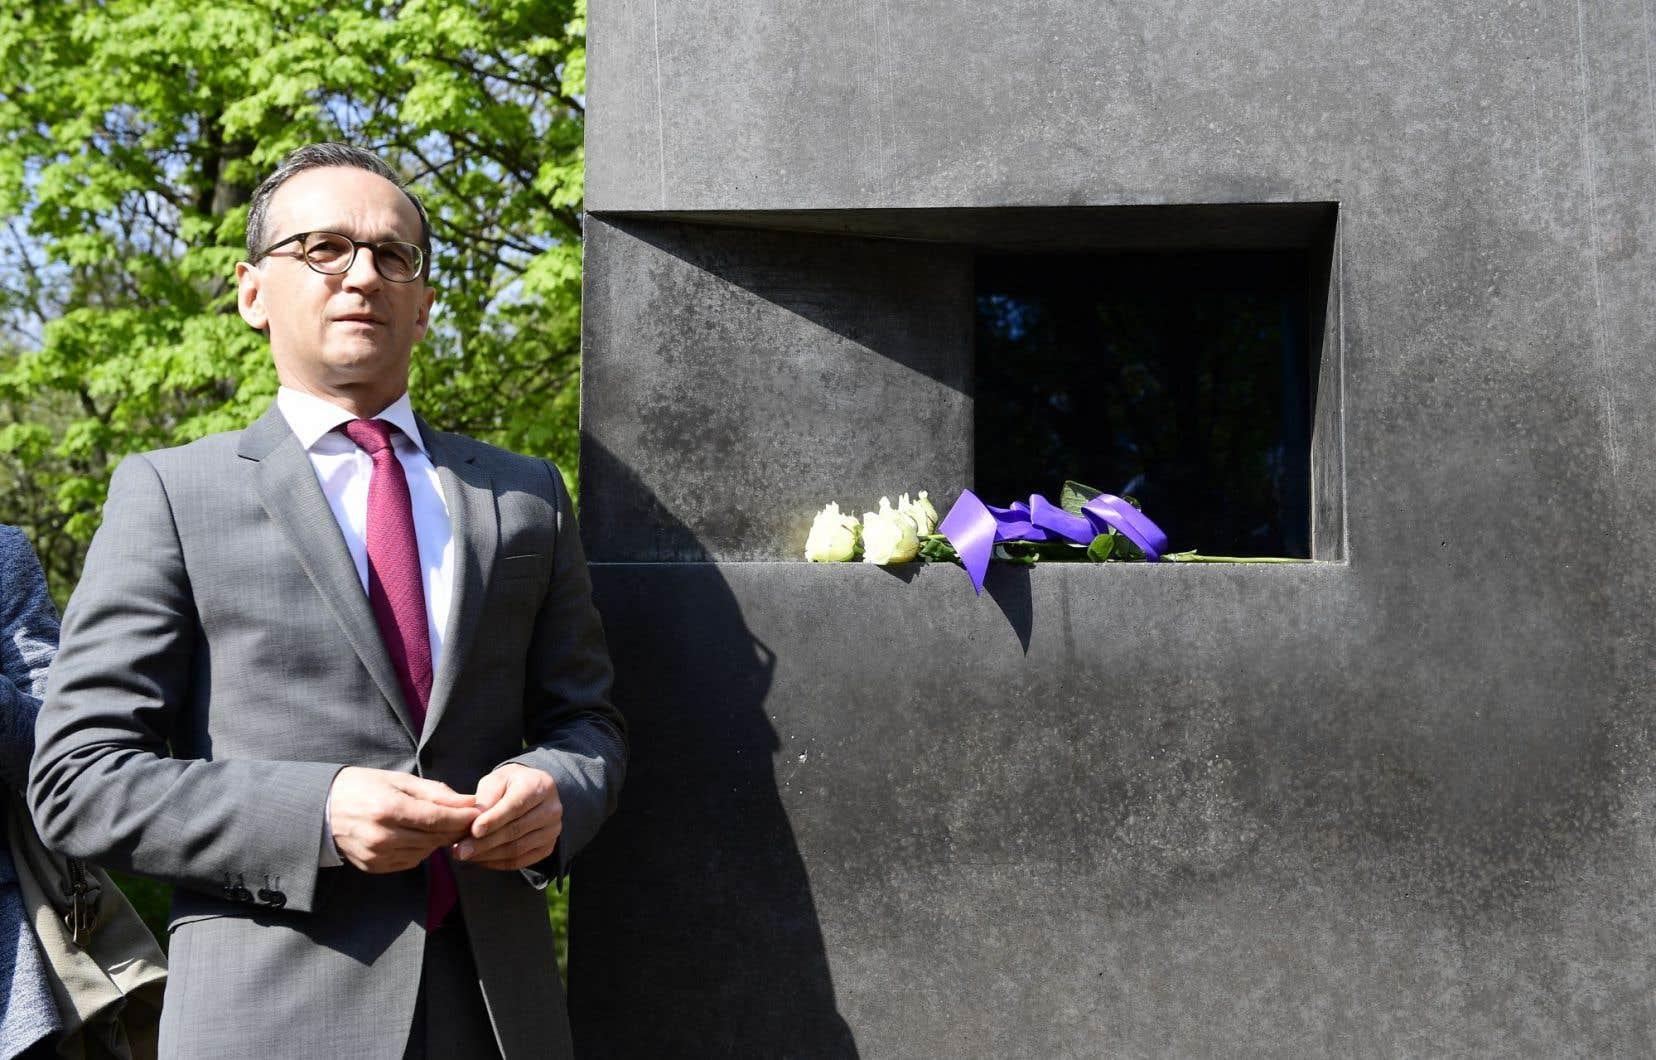 Le ministre allemand de la Justice, Heiko Maas